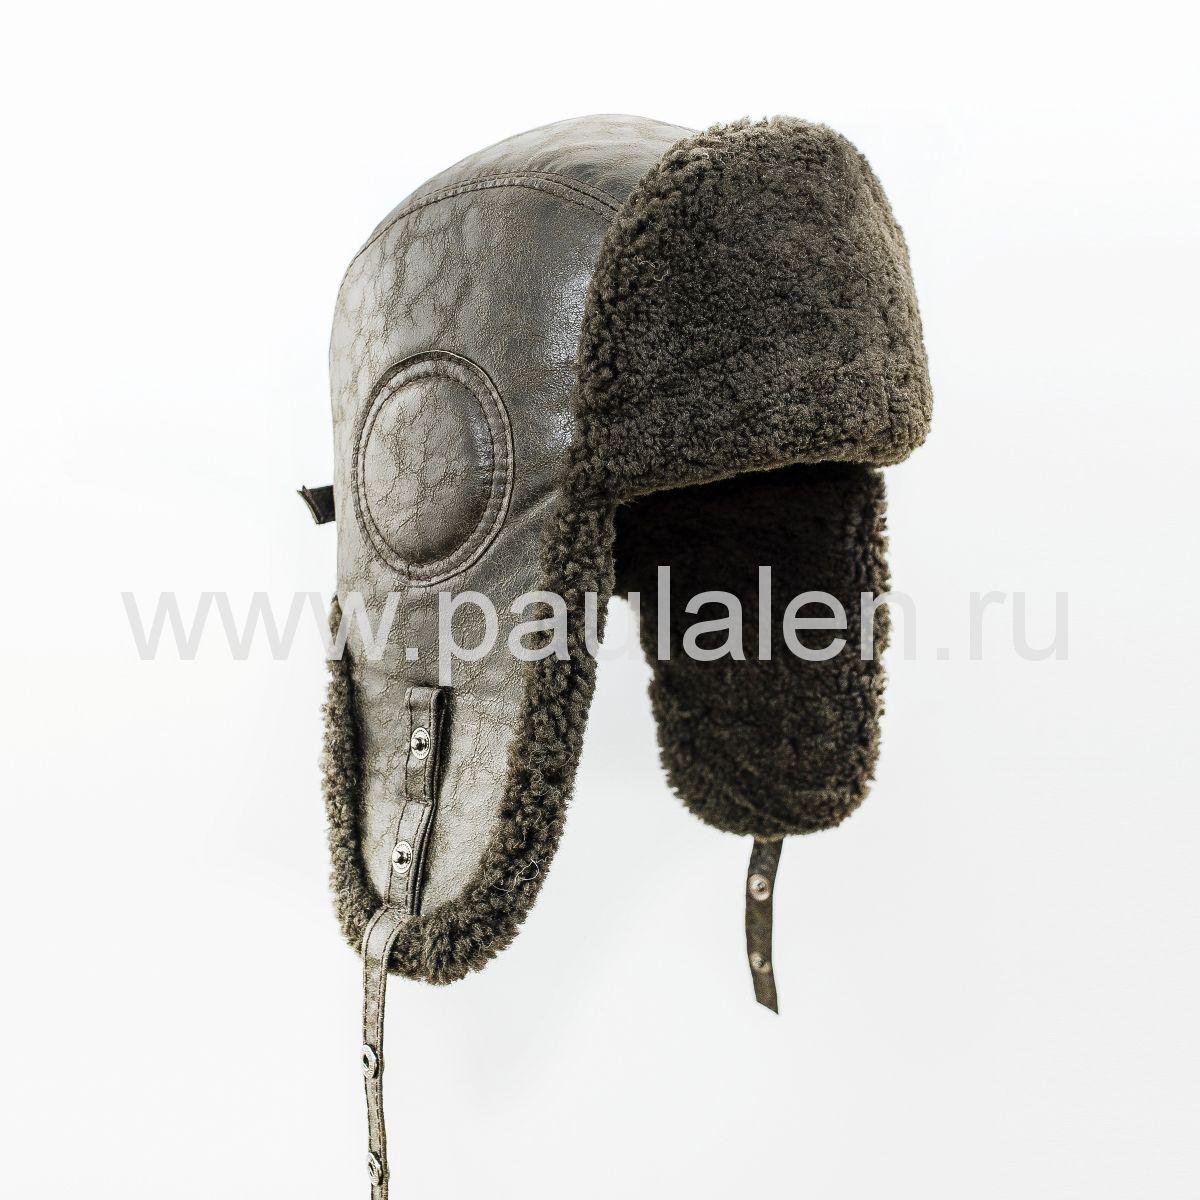 "Мужская шапка ушанка ""Авиатор"" из кожи и меха овчины. Артикул B054"